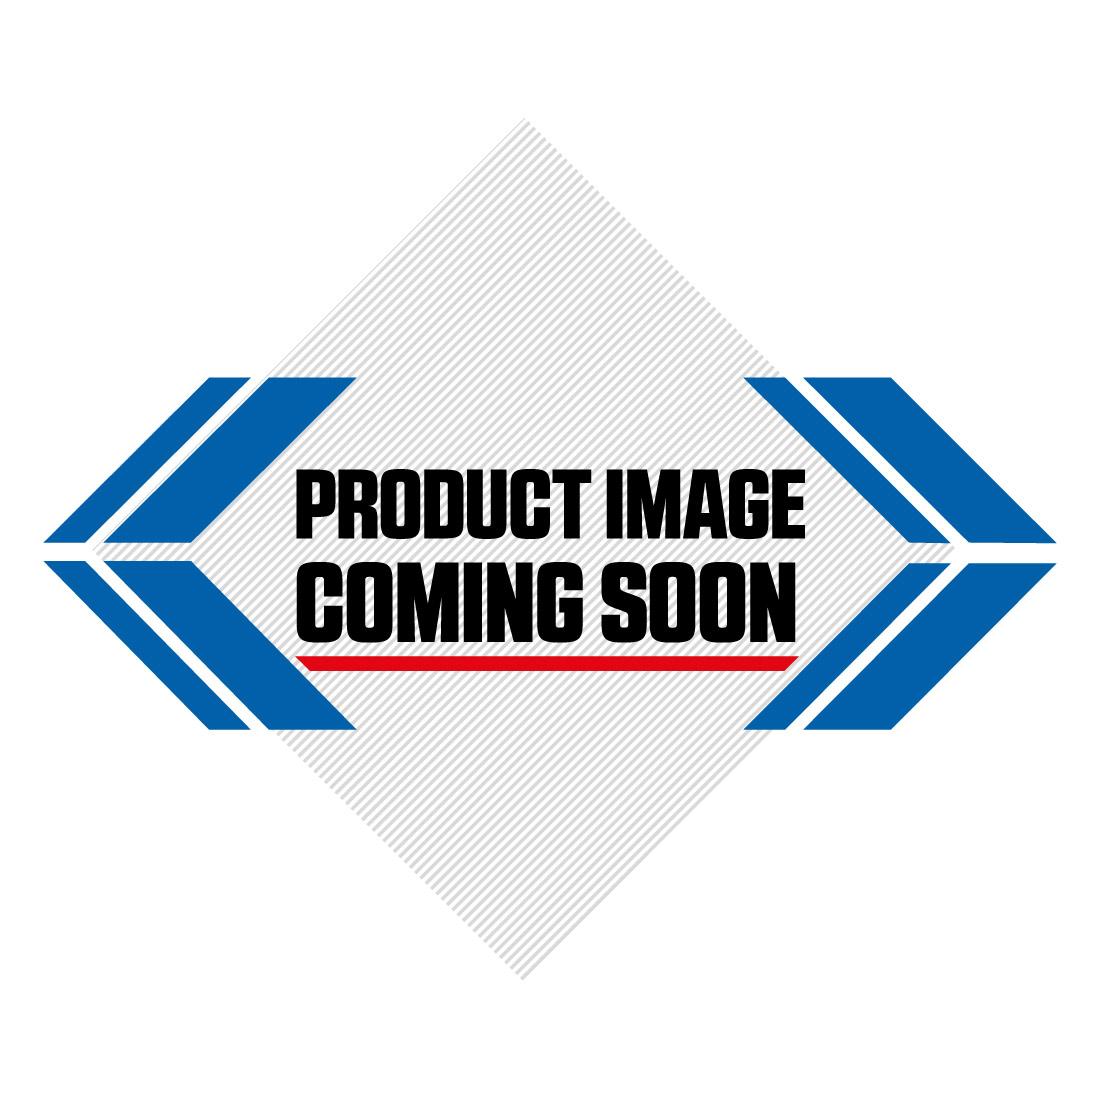 UFO Division Acqua Marina Motocross Kit Combo Image-2